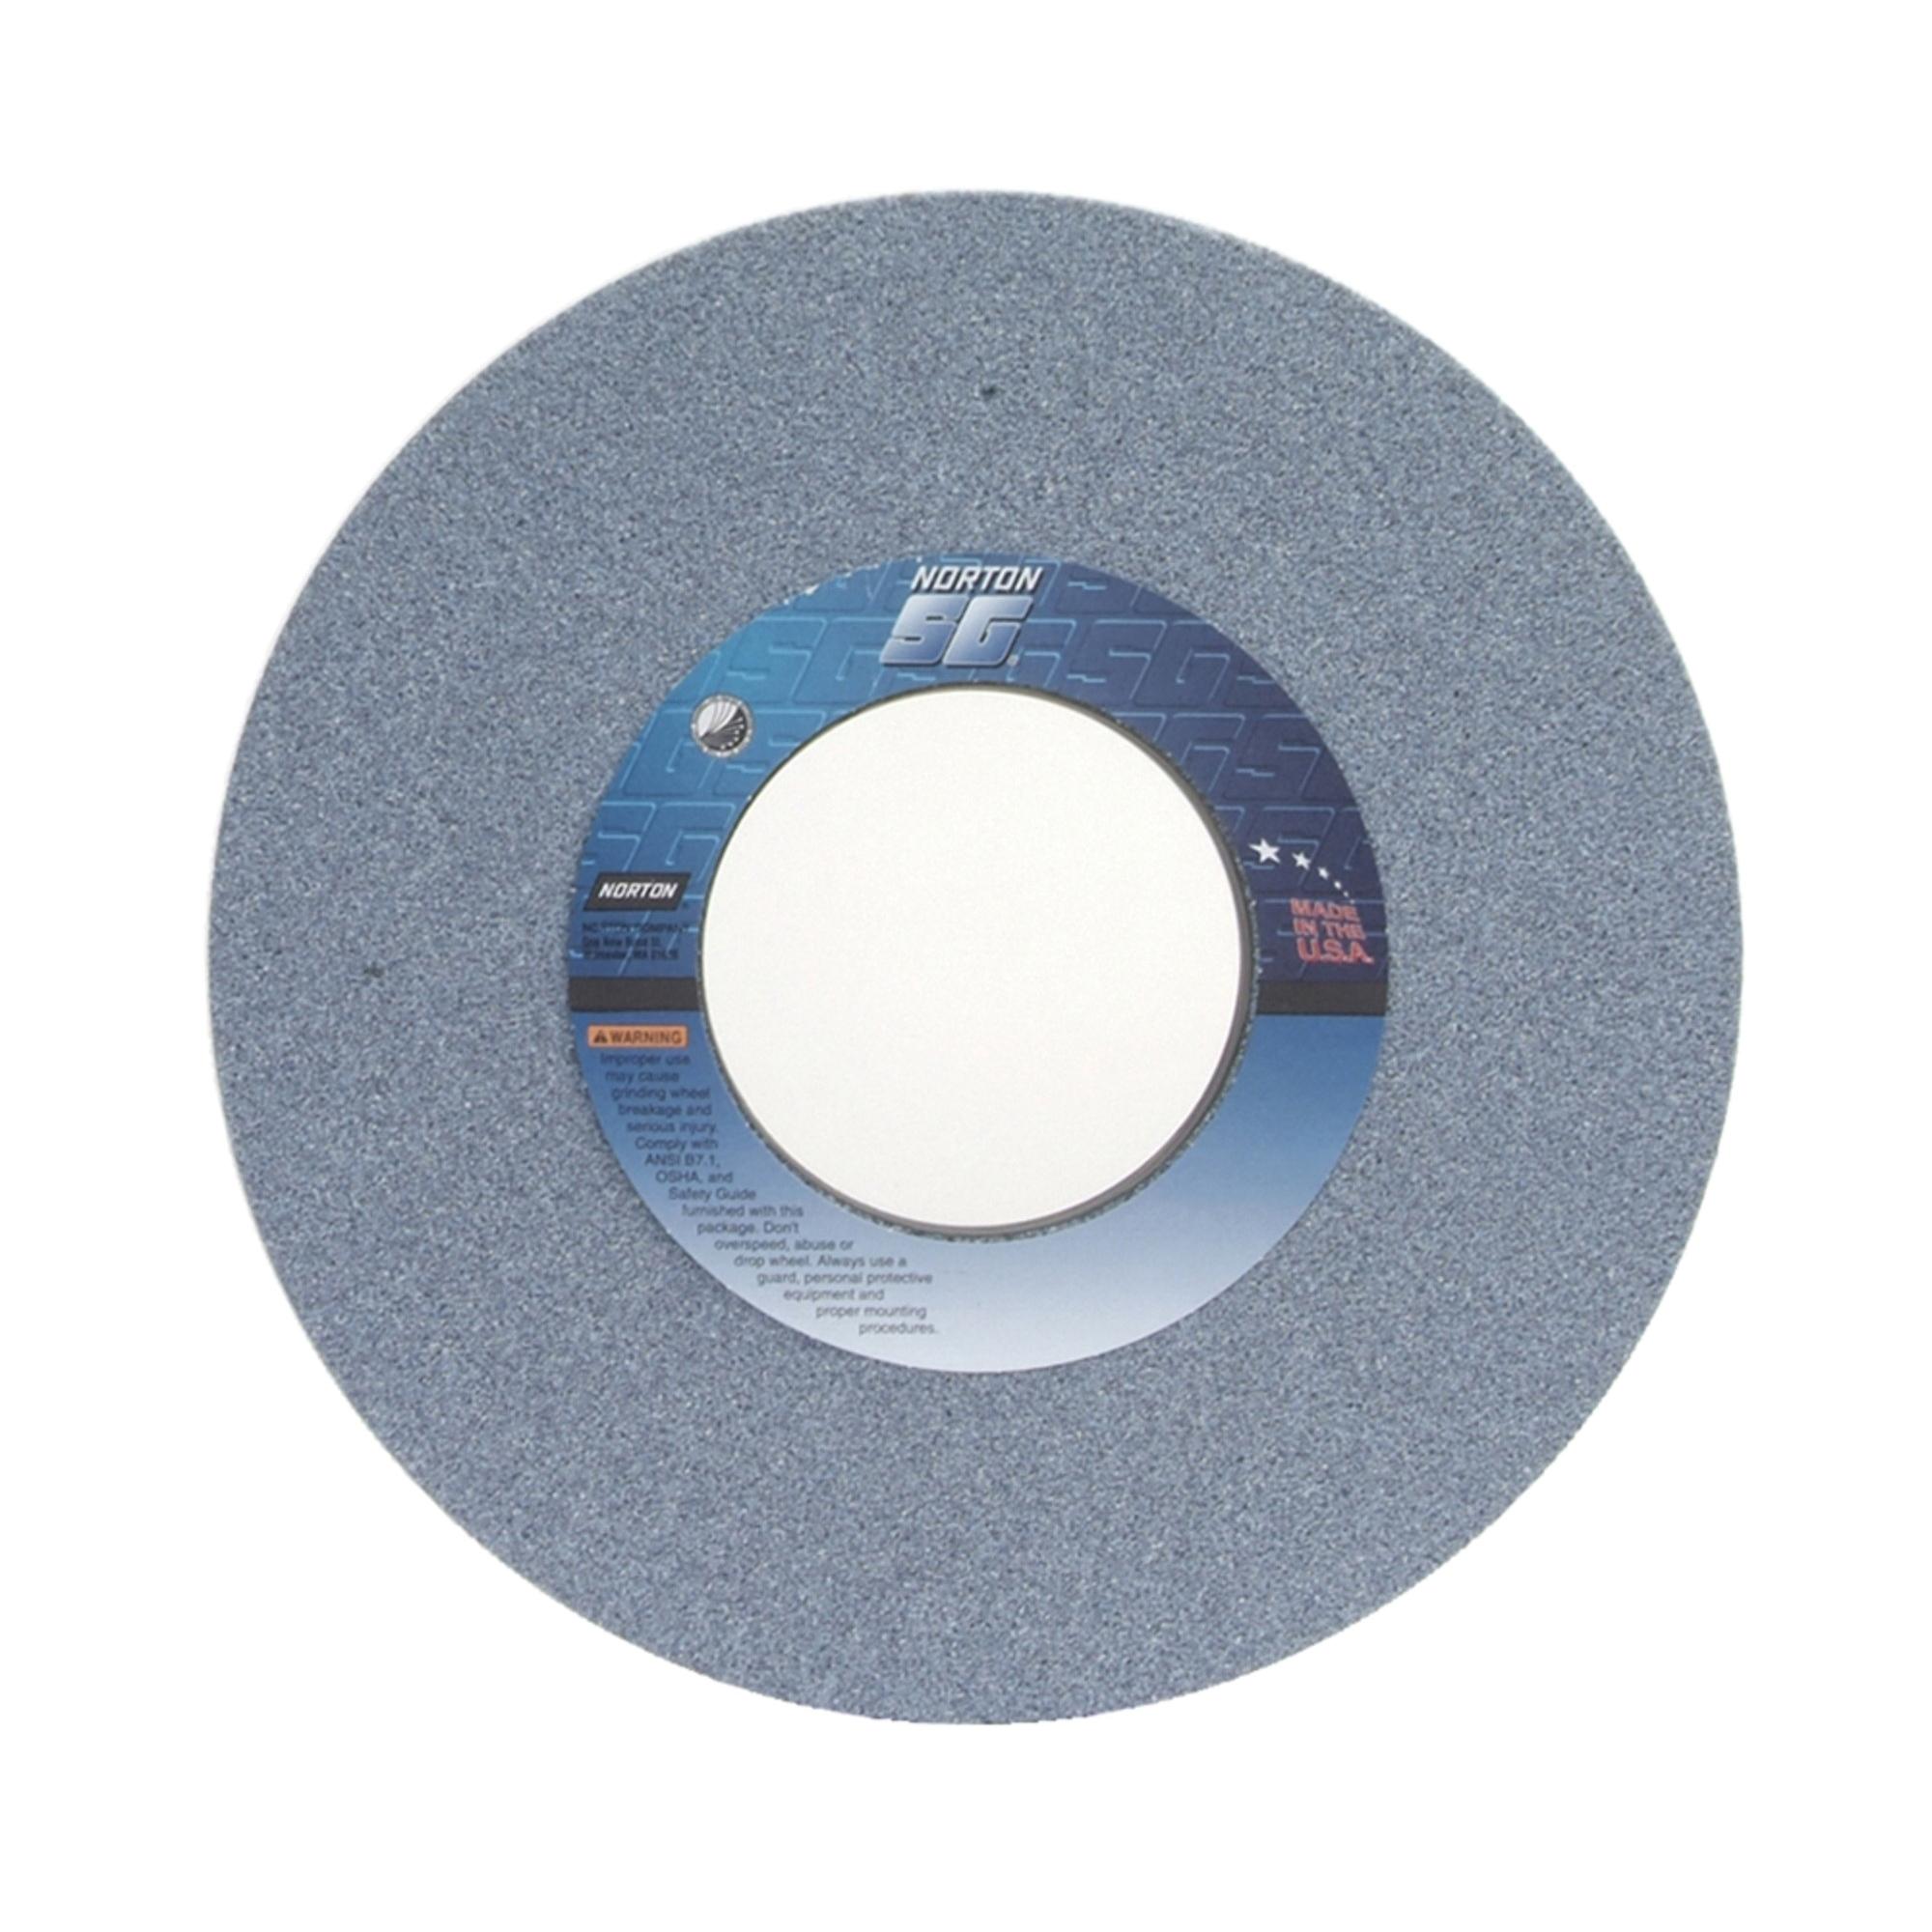 Norton® 66253307025 3SGP Straight Toolroom Wheel, 14 in Dia x 1-1/2 in THK, 5 in Center Hole, 46 Grit, Ceramic Alumina/Friable Aluminum Oxide Abrasive